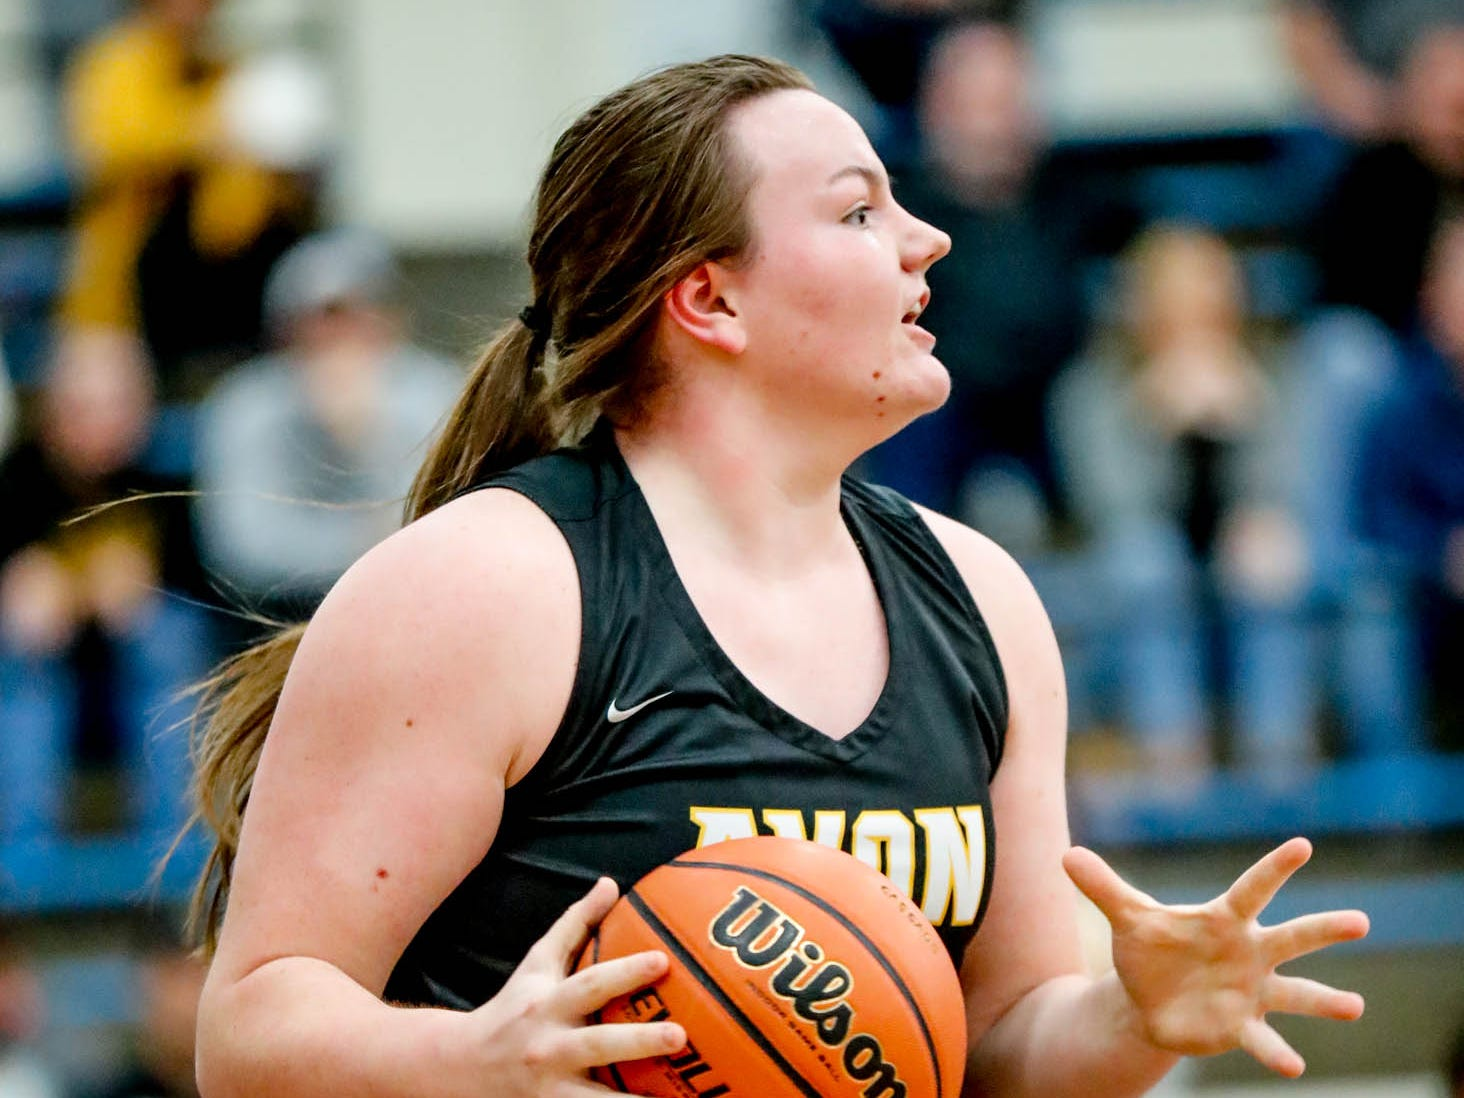 Avon High School's Haley Nichols (44), runs a play during a 2019 Hendricks County Basketball Tournament game between the Avon High School girls varsity basketball team and Brownsburg High School, held at Cascade High School on Saturday, Jan. 5, 2019.